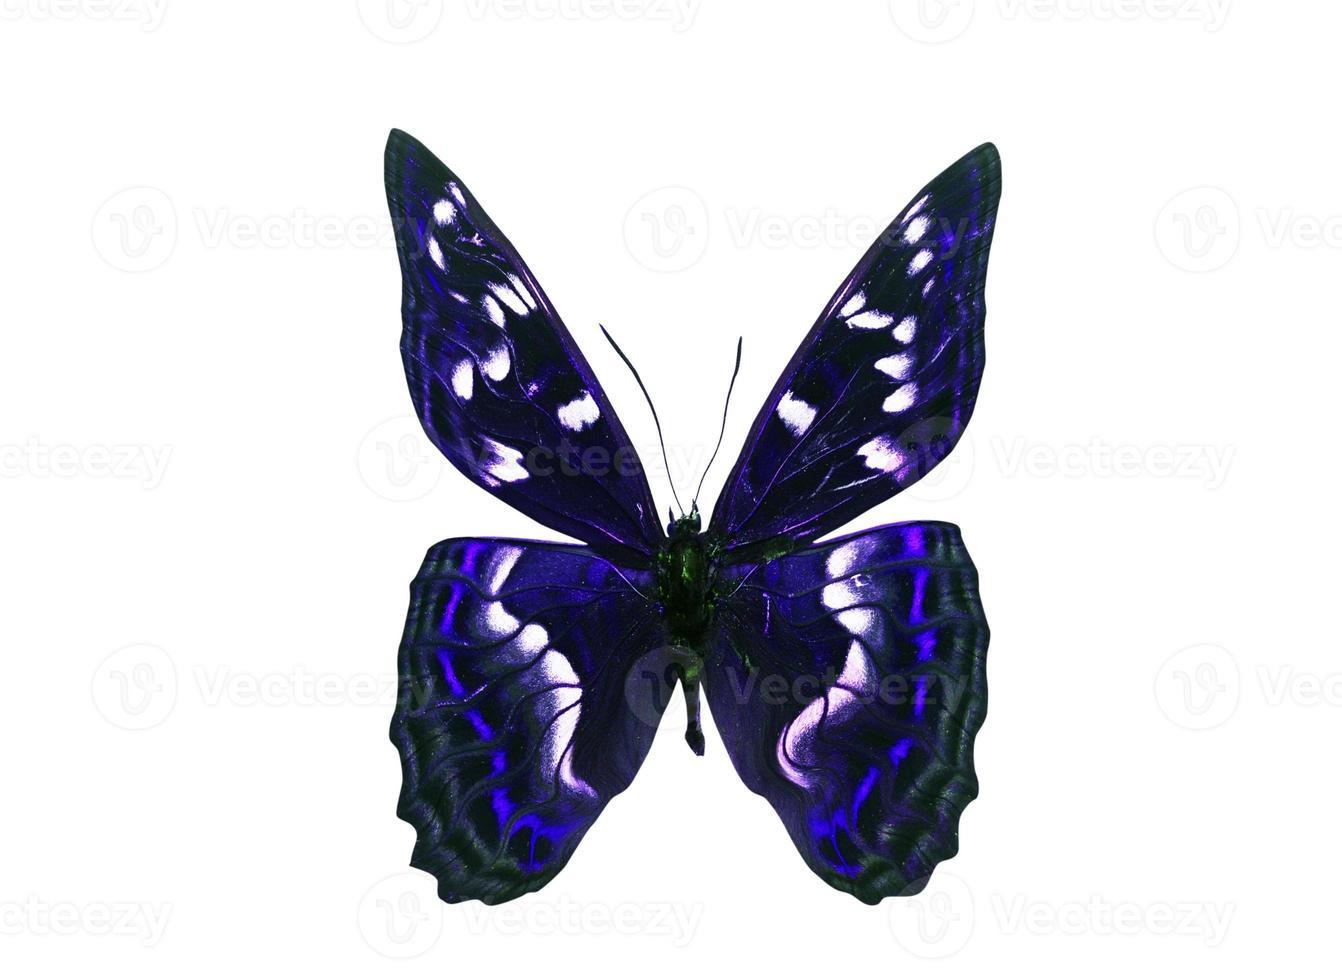 donkere kleur vlinder met paarse vleugels. geïsoleerd op witte achtergrond foto